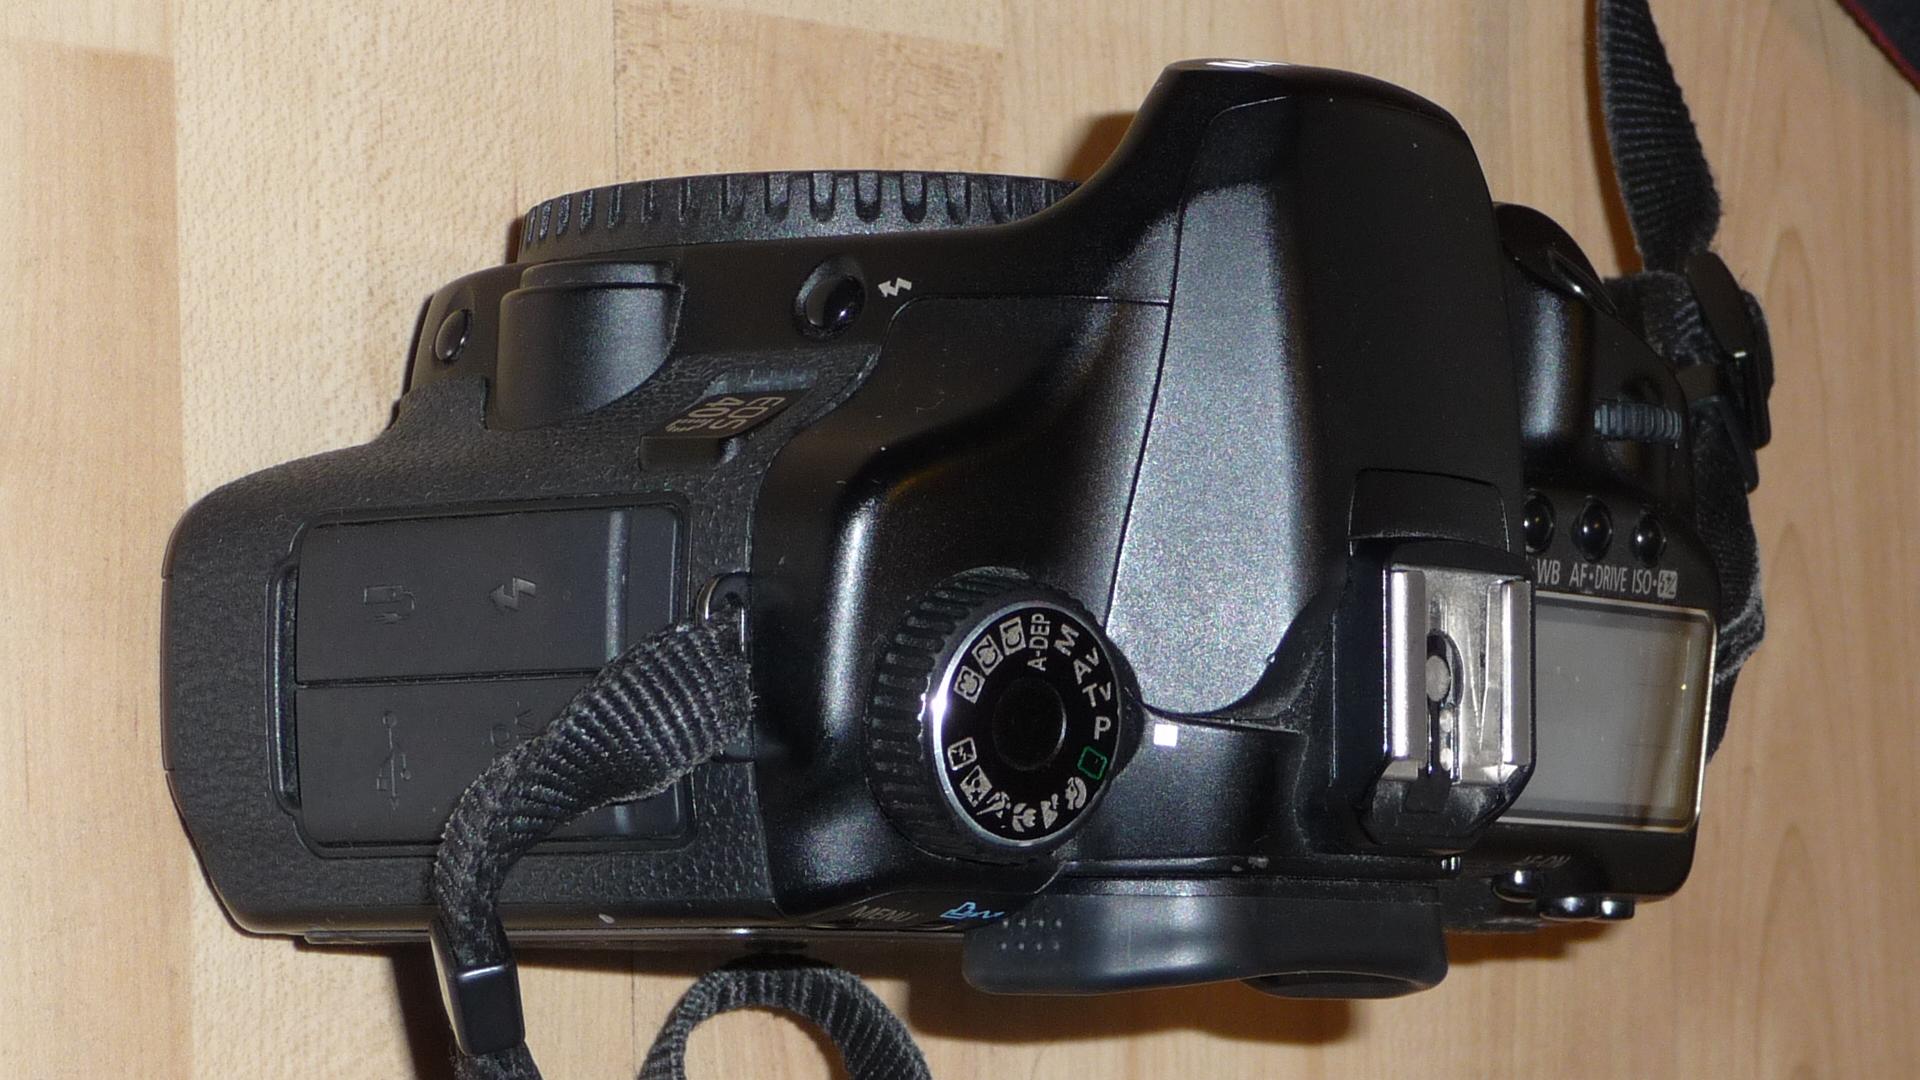 54433_Canon40D-4_122_554lo.JPG